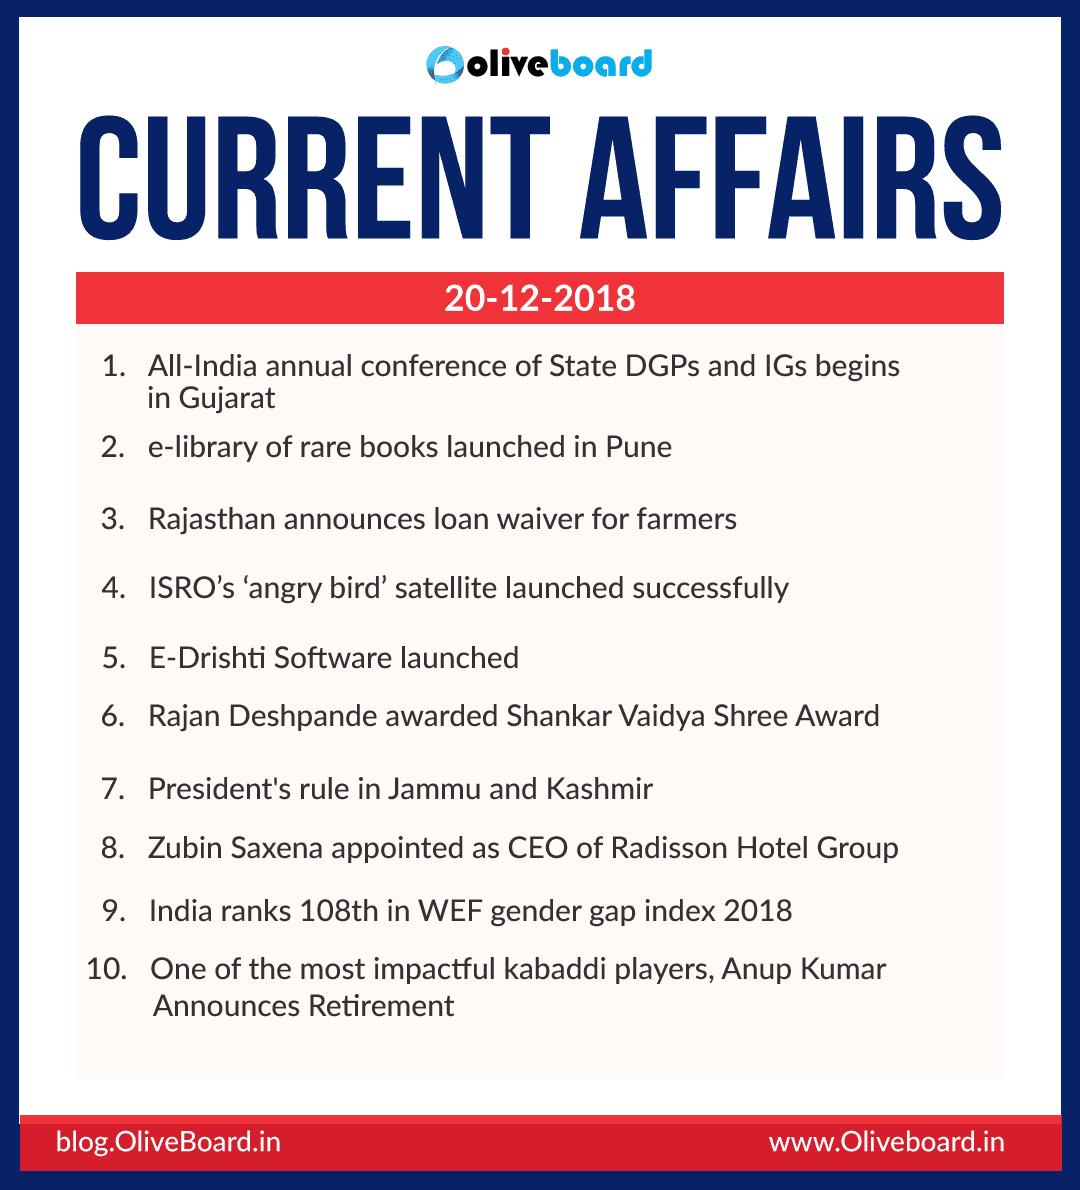 Current Affairs: 20 December 2018